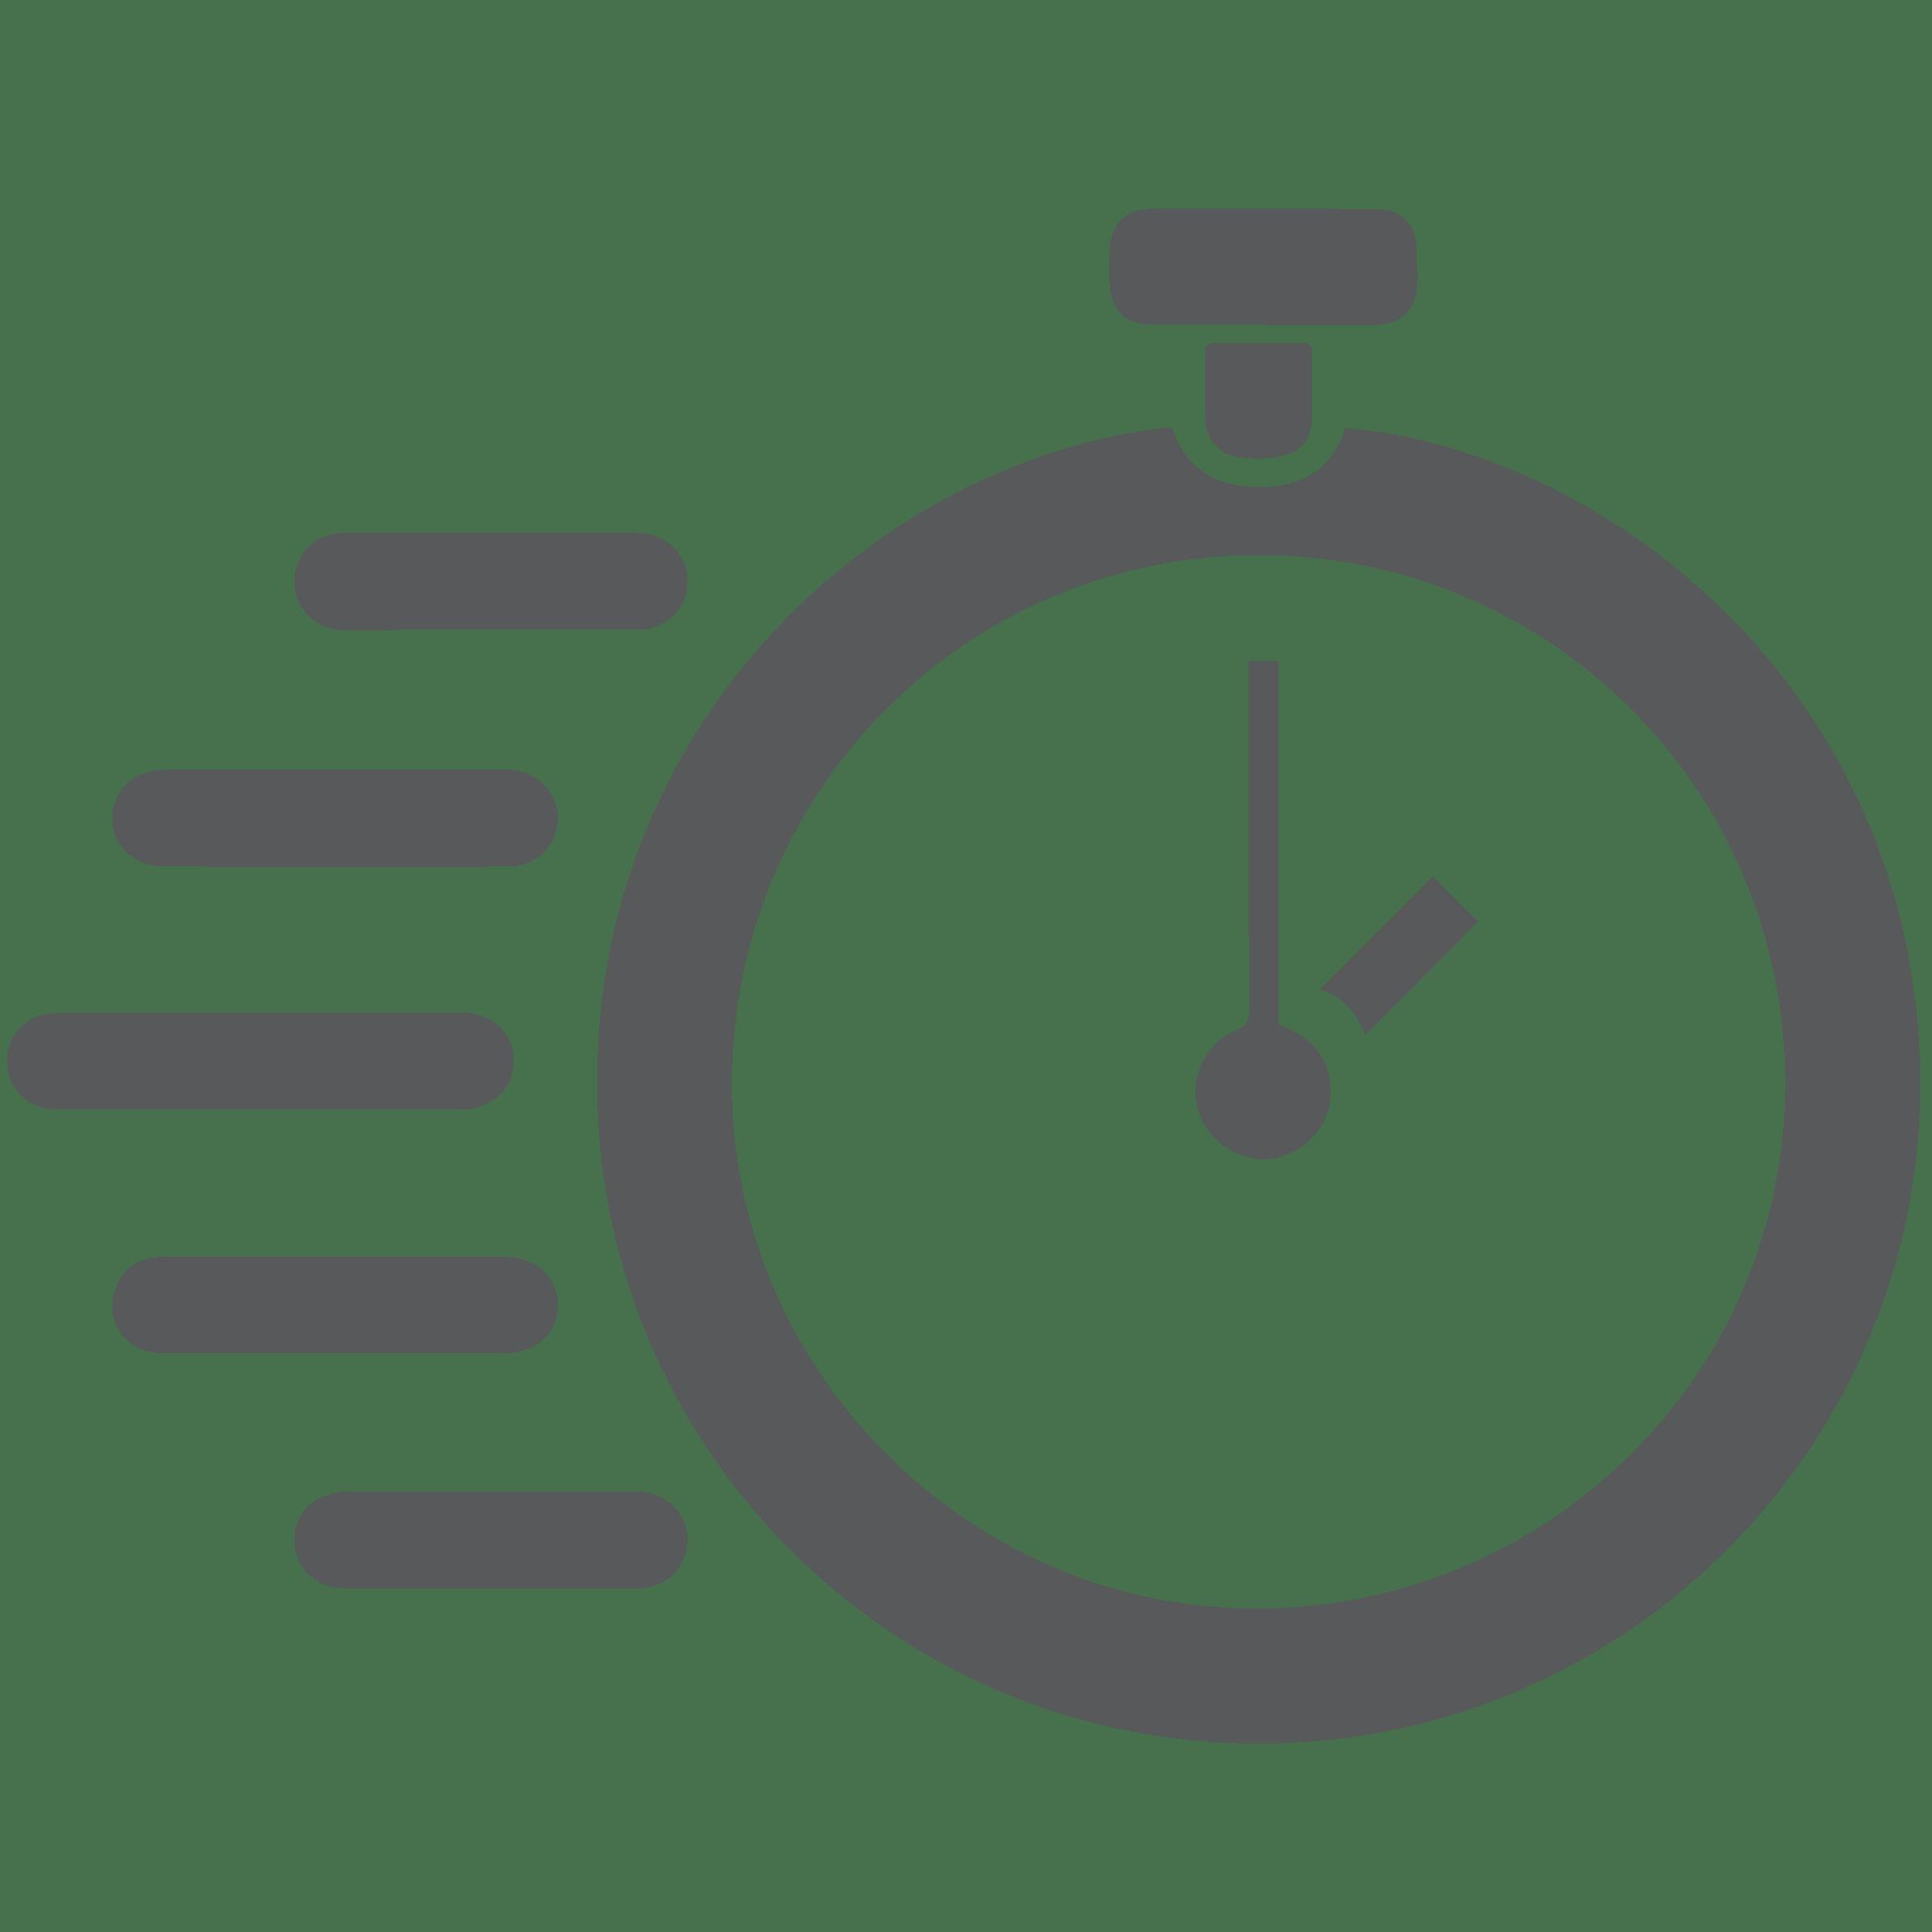 Speed stopwatch icon